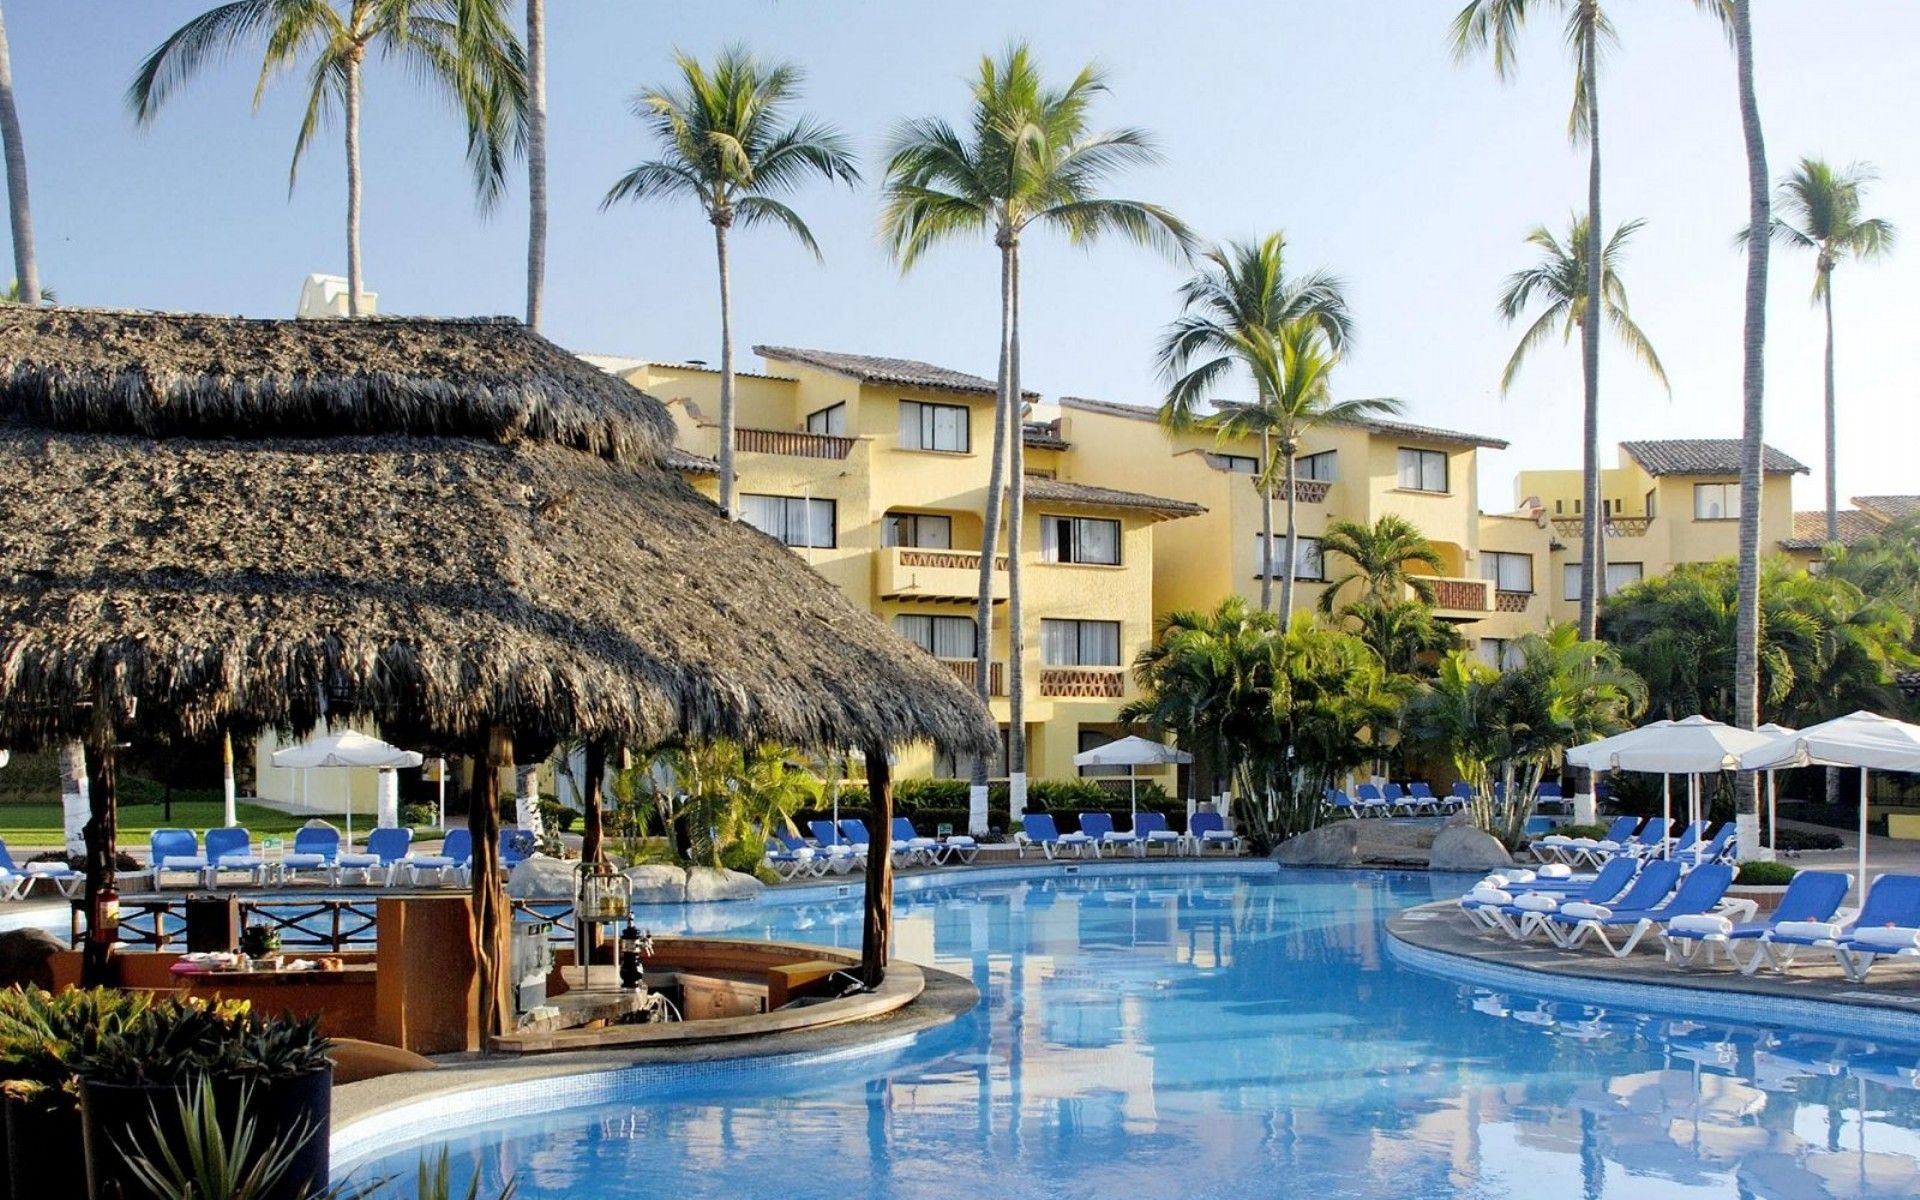 Barcelona Beach Resort Hotels